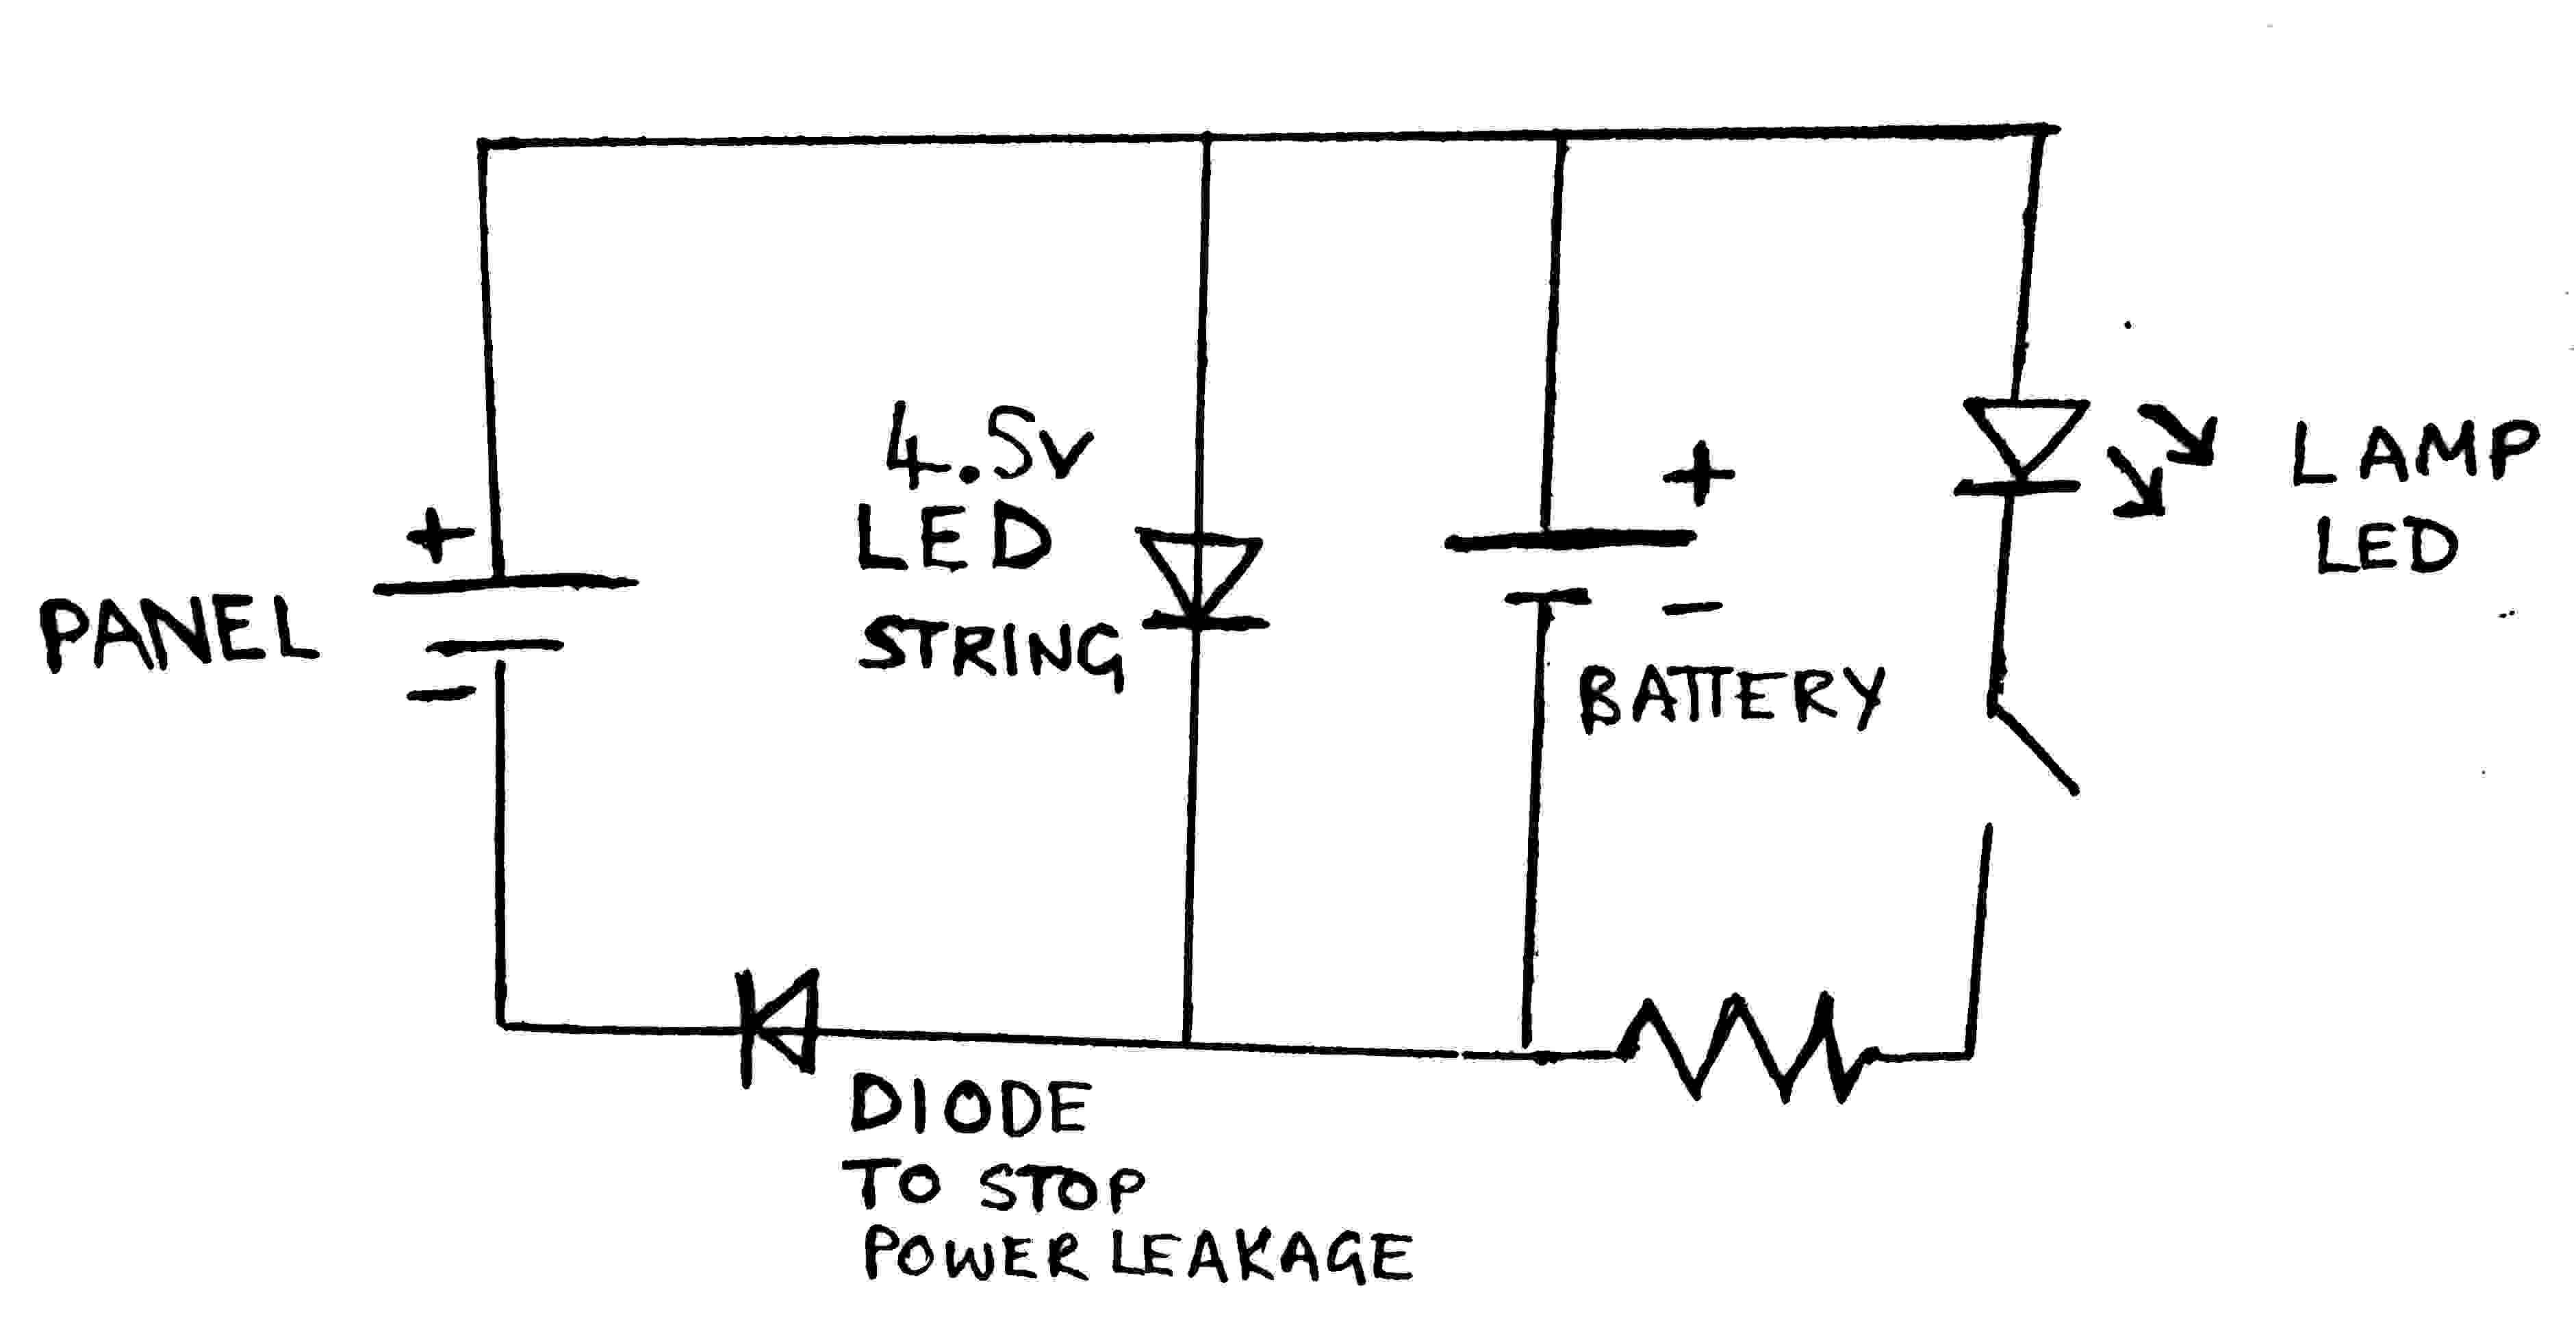 small resolution of 120v led wiring diagram wiring diagram blogs wiring diagram 120v led string lighting 120v led wiring diagram